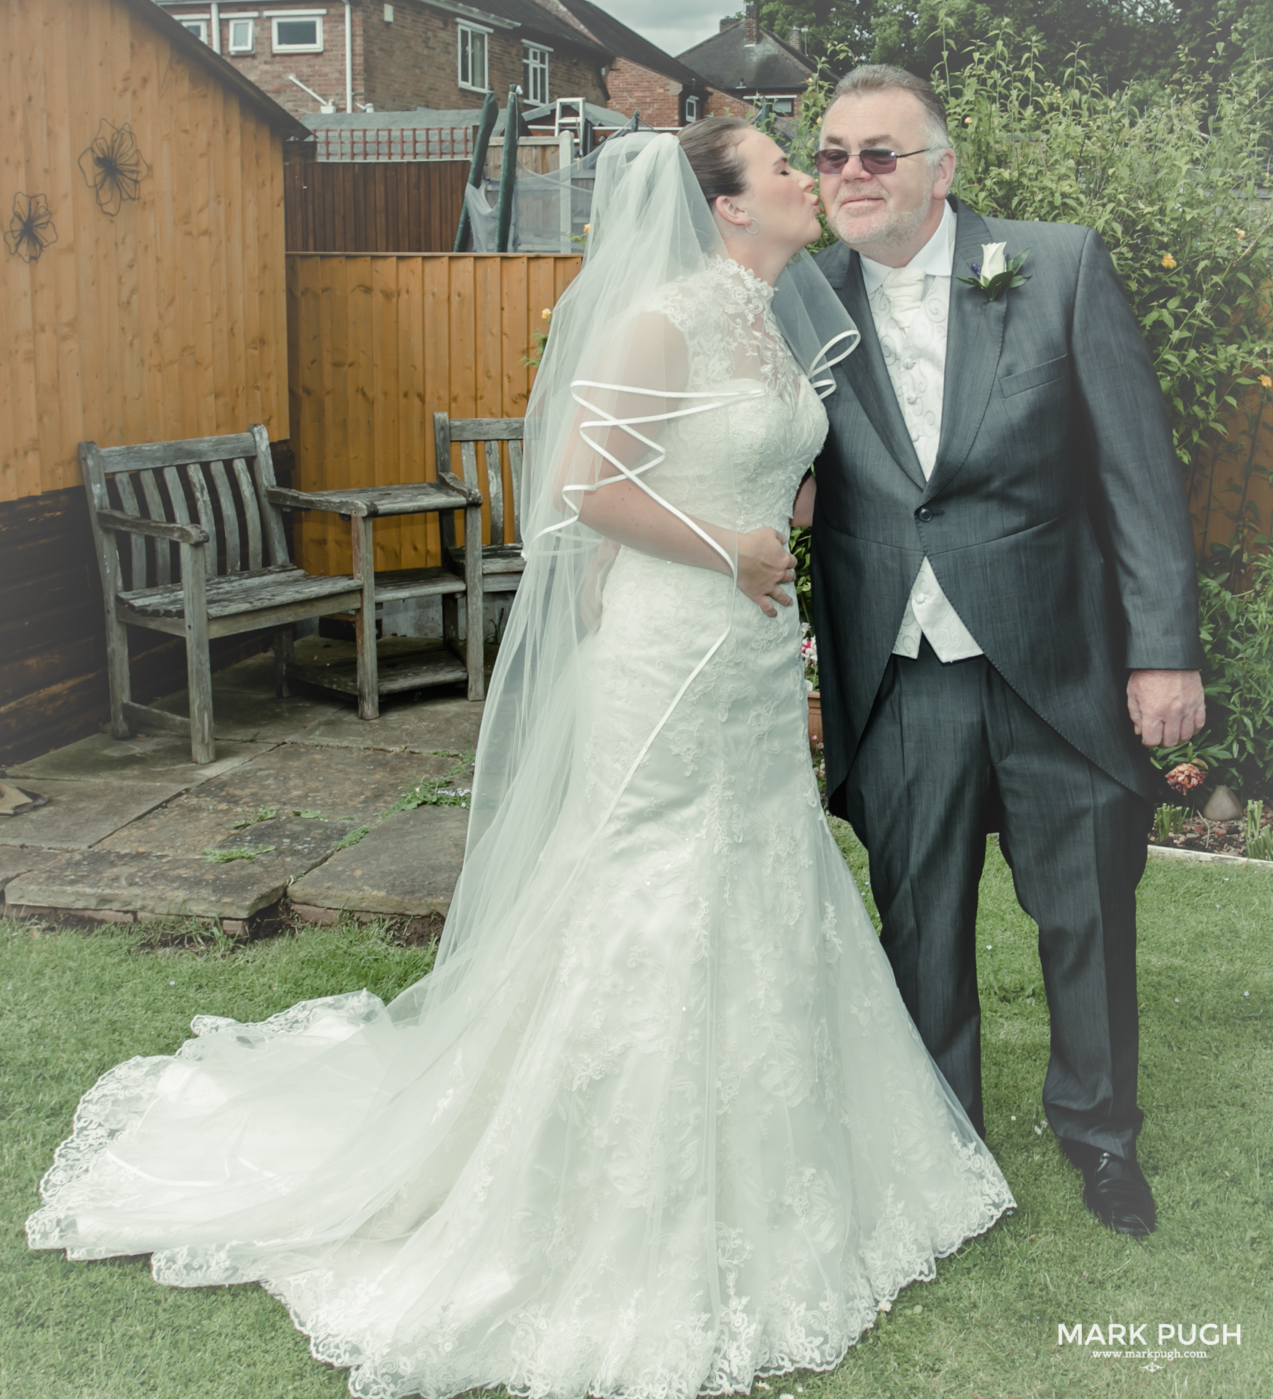 054- Laura and Peter - Wollaton Hall Wedding Nottingham UK by Mark Pugh www.markpugh.com.jpg